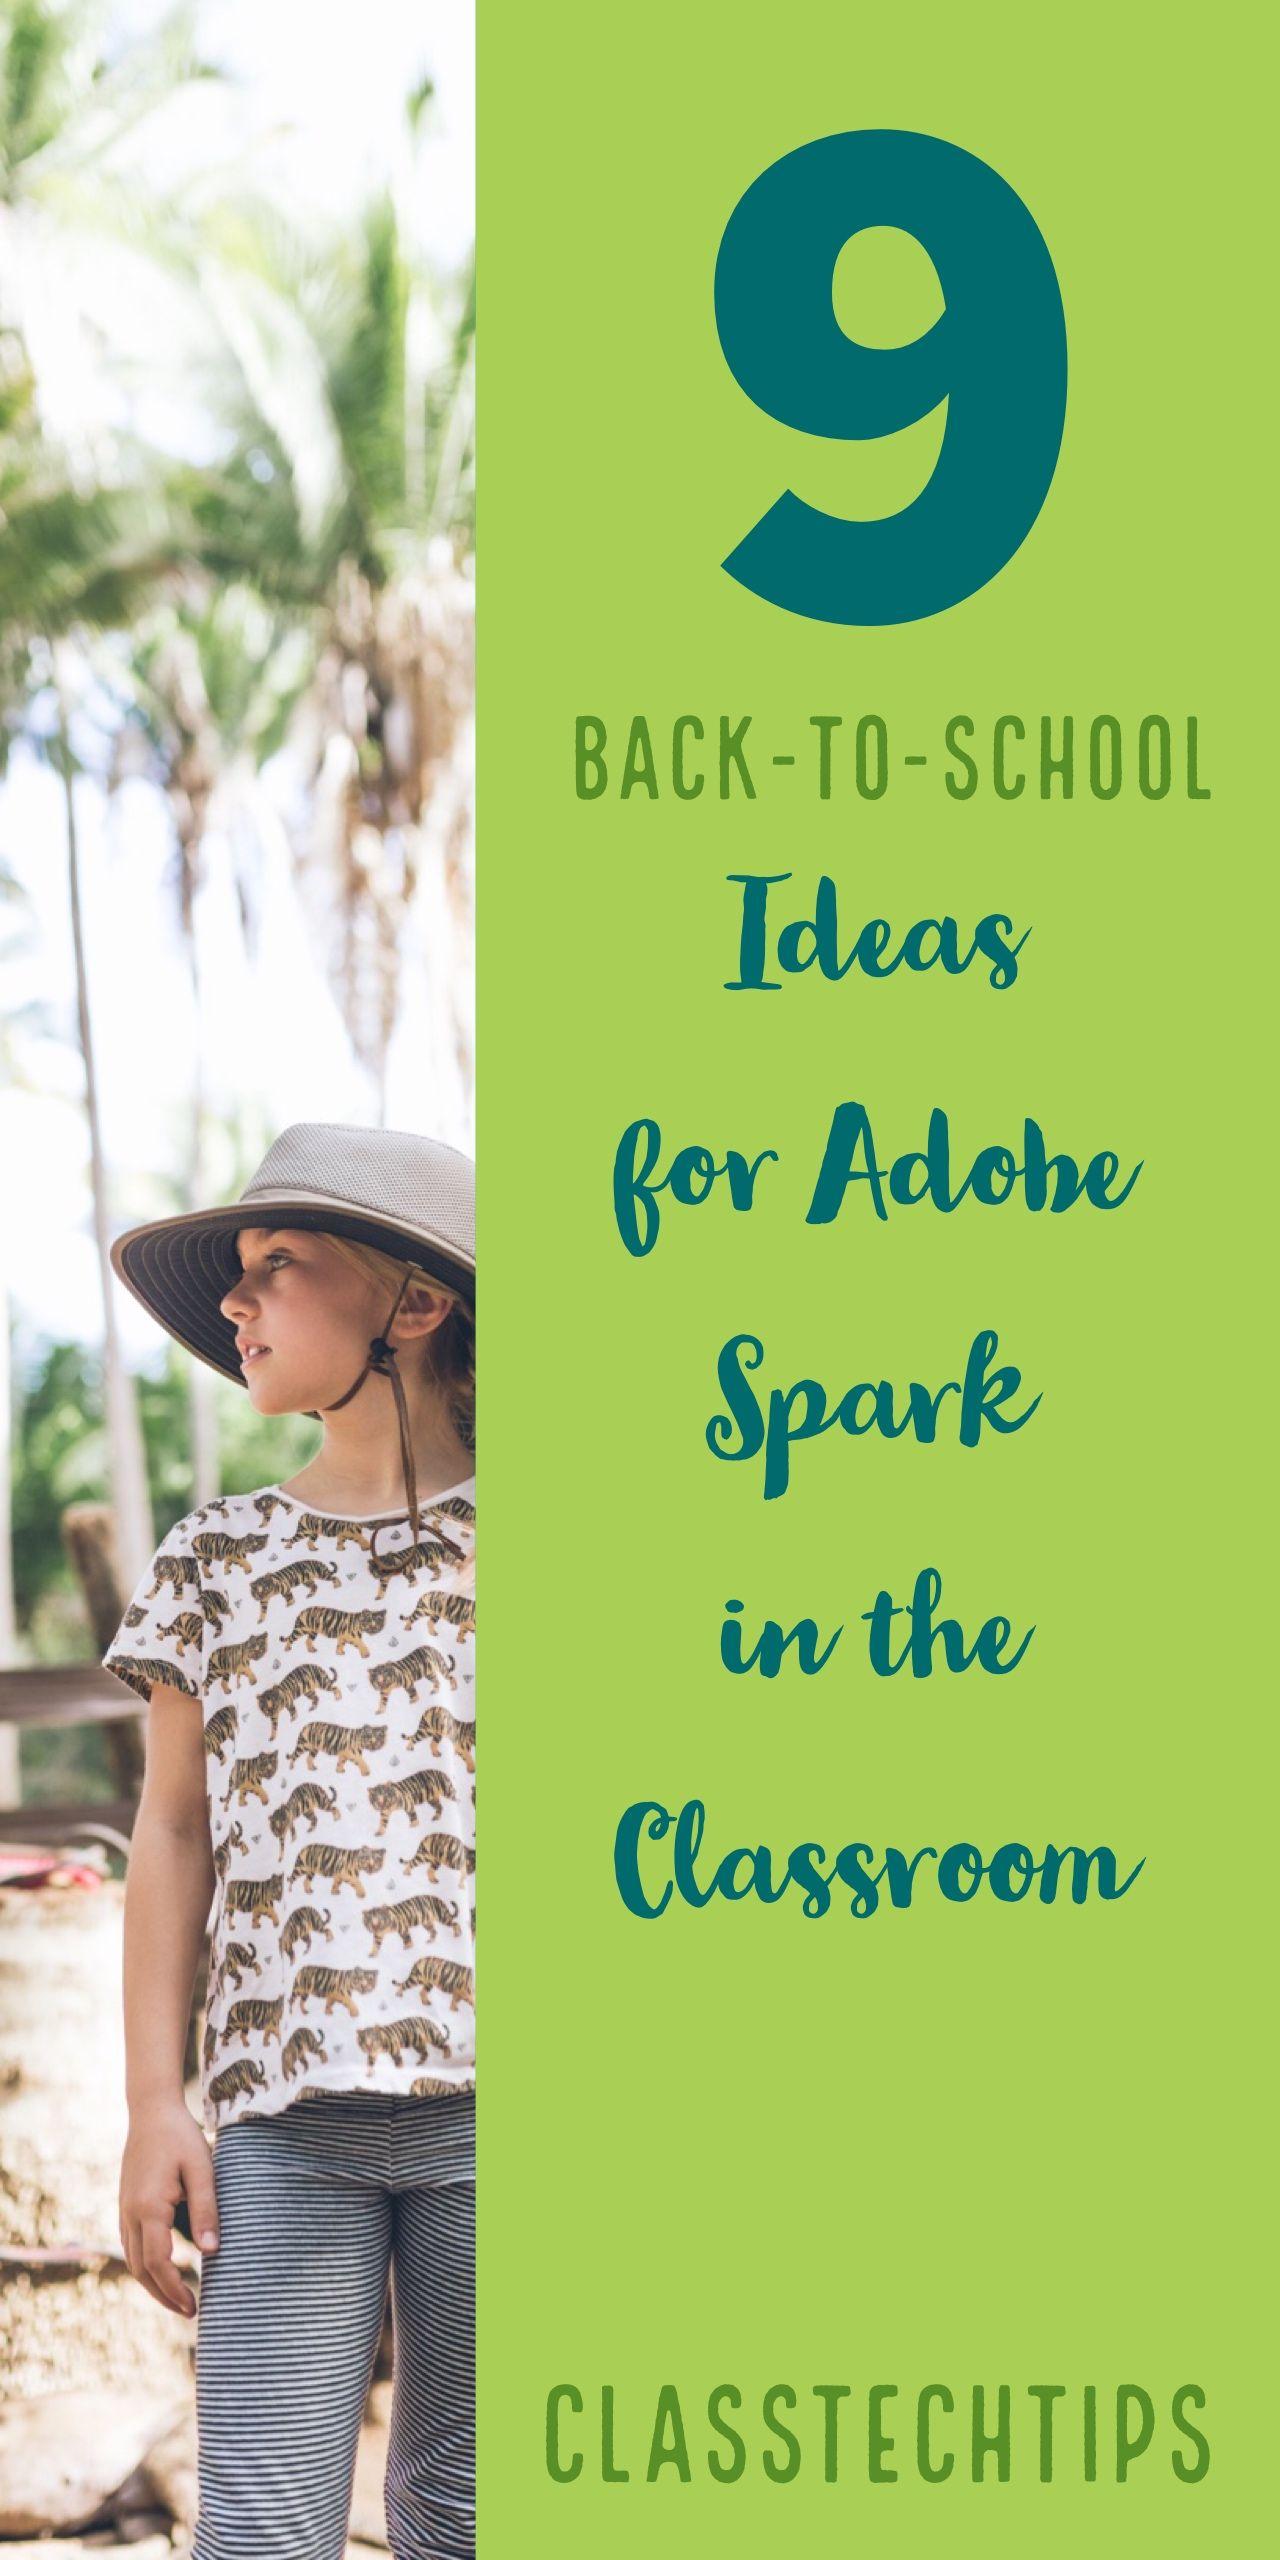 9 BackToSchool Ideas for Adobe Spark in the Classroom